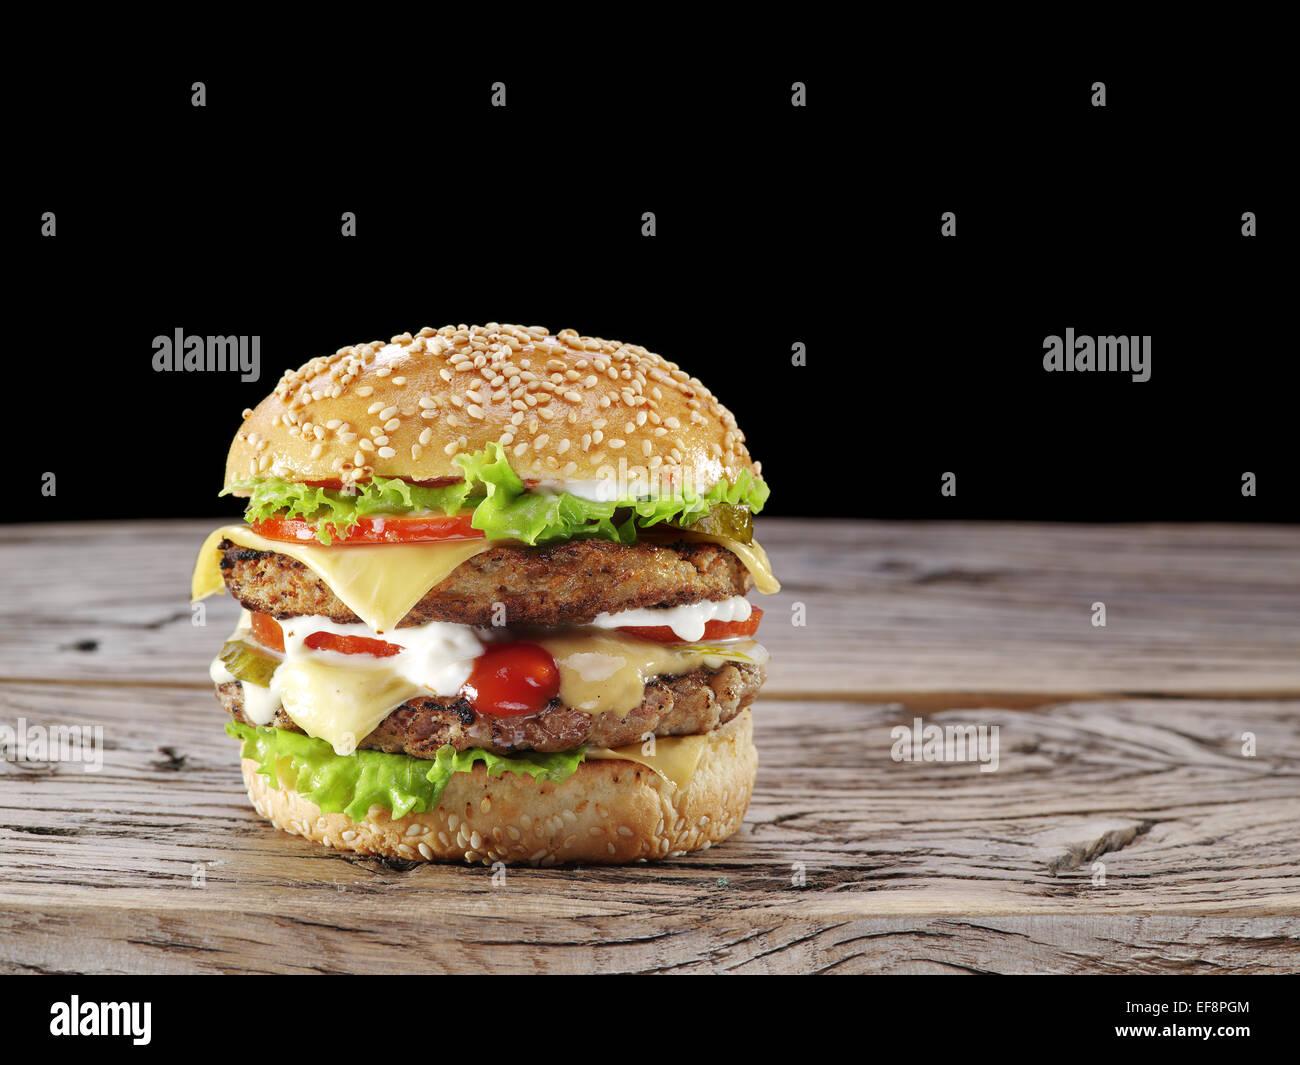 Hamburger on old wooden table. - Stock Image